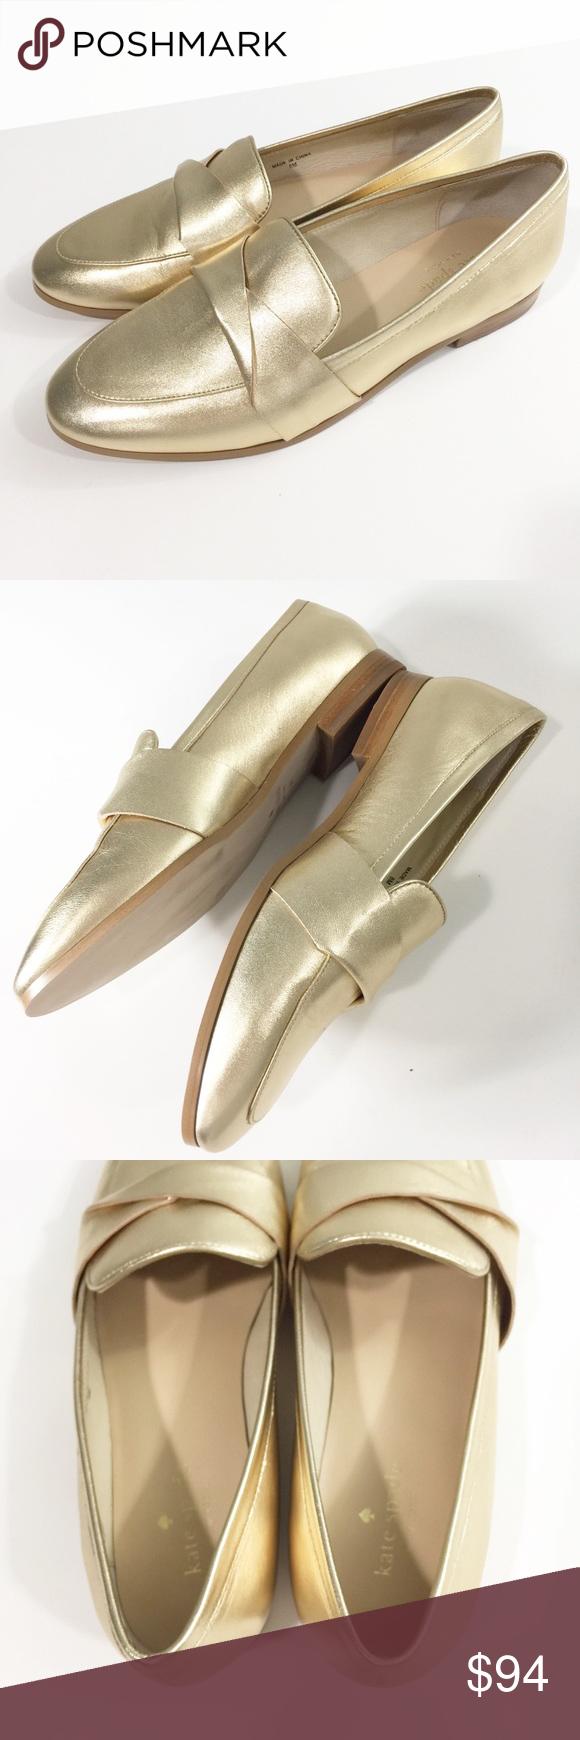 83cc5d882ad Kate Spade Satchi gold metallic loafer flats Sz 8 Kate Spade Satchi gold  metallic loafer flats